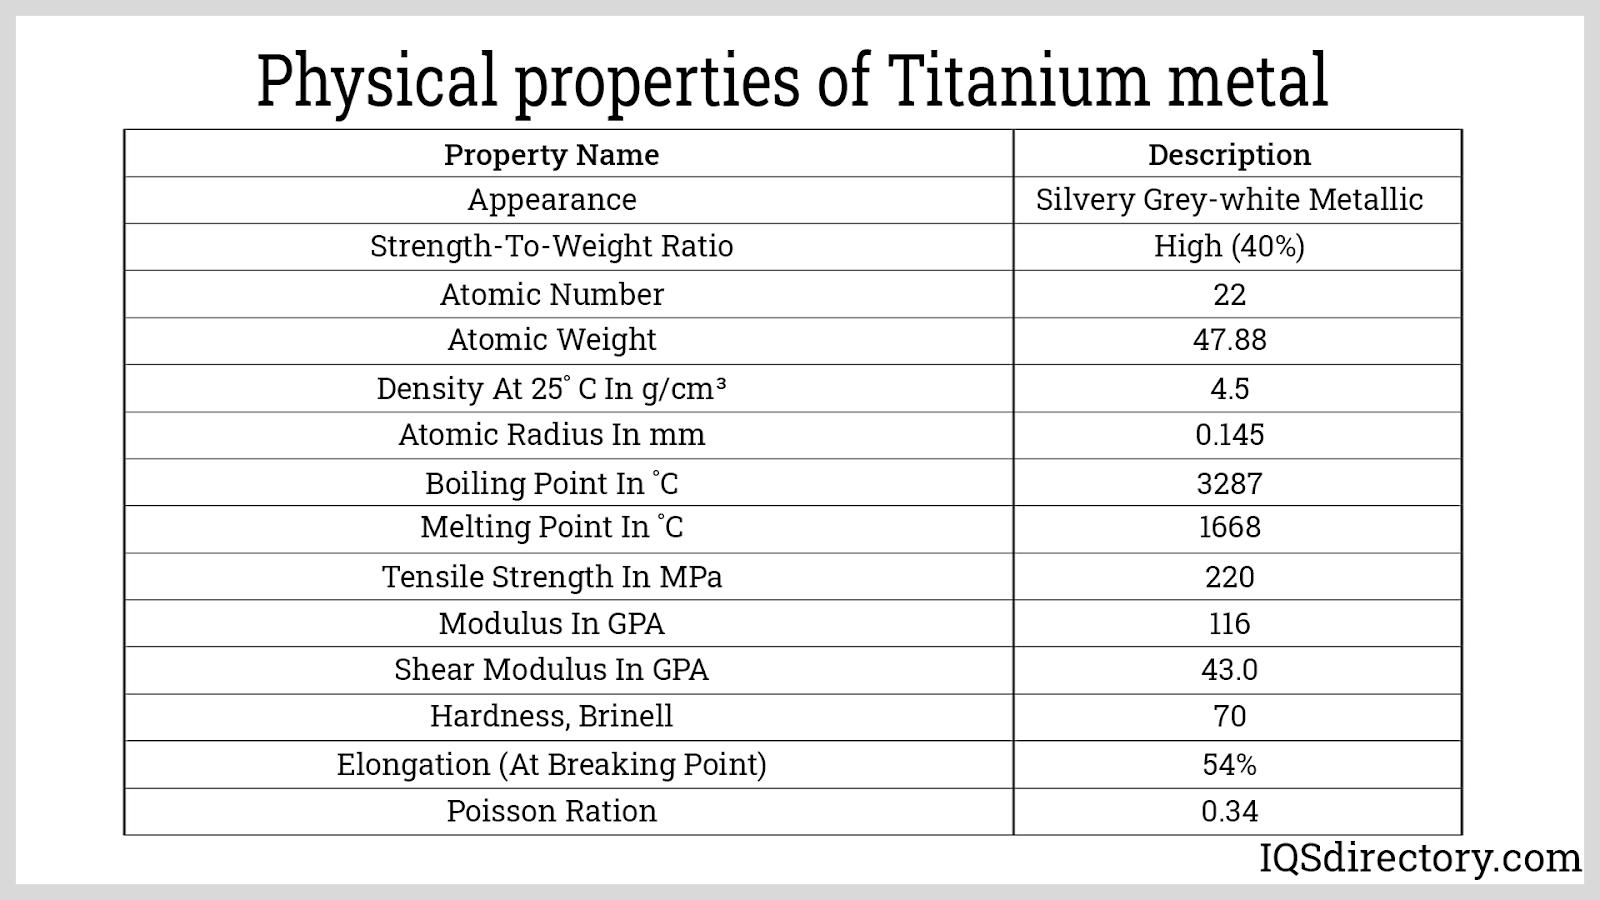 Physical Properties of Titanium metal